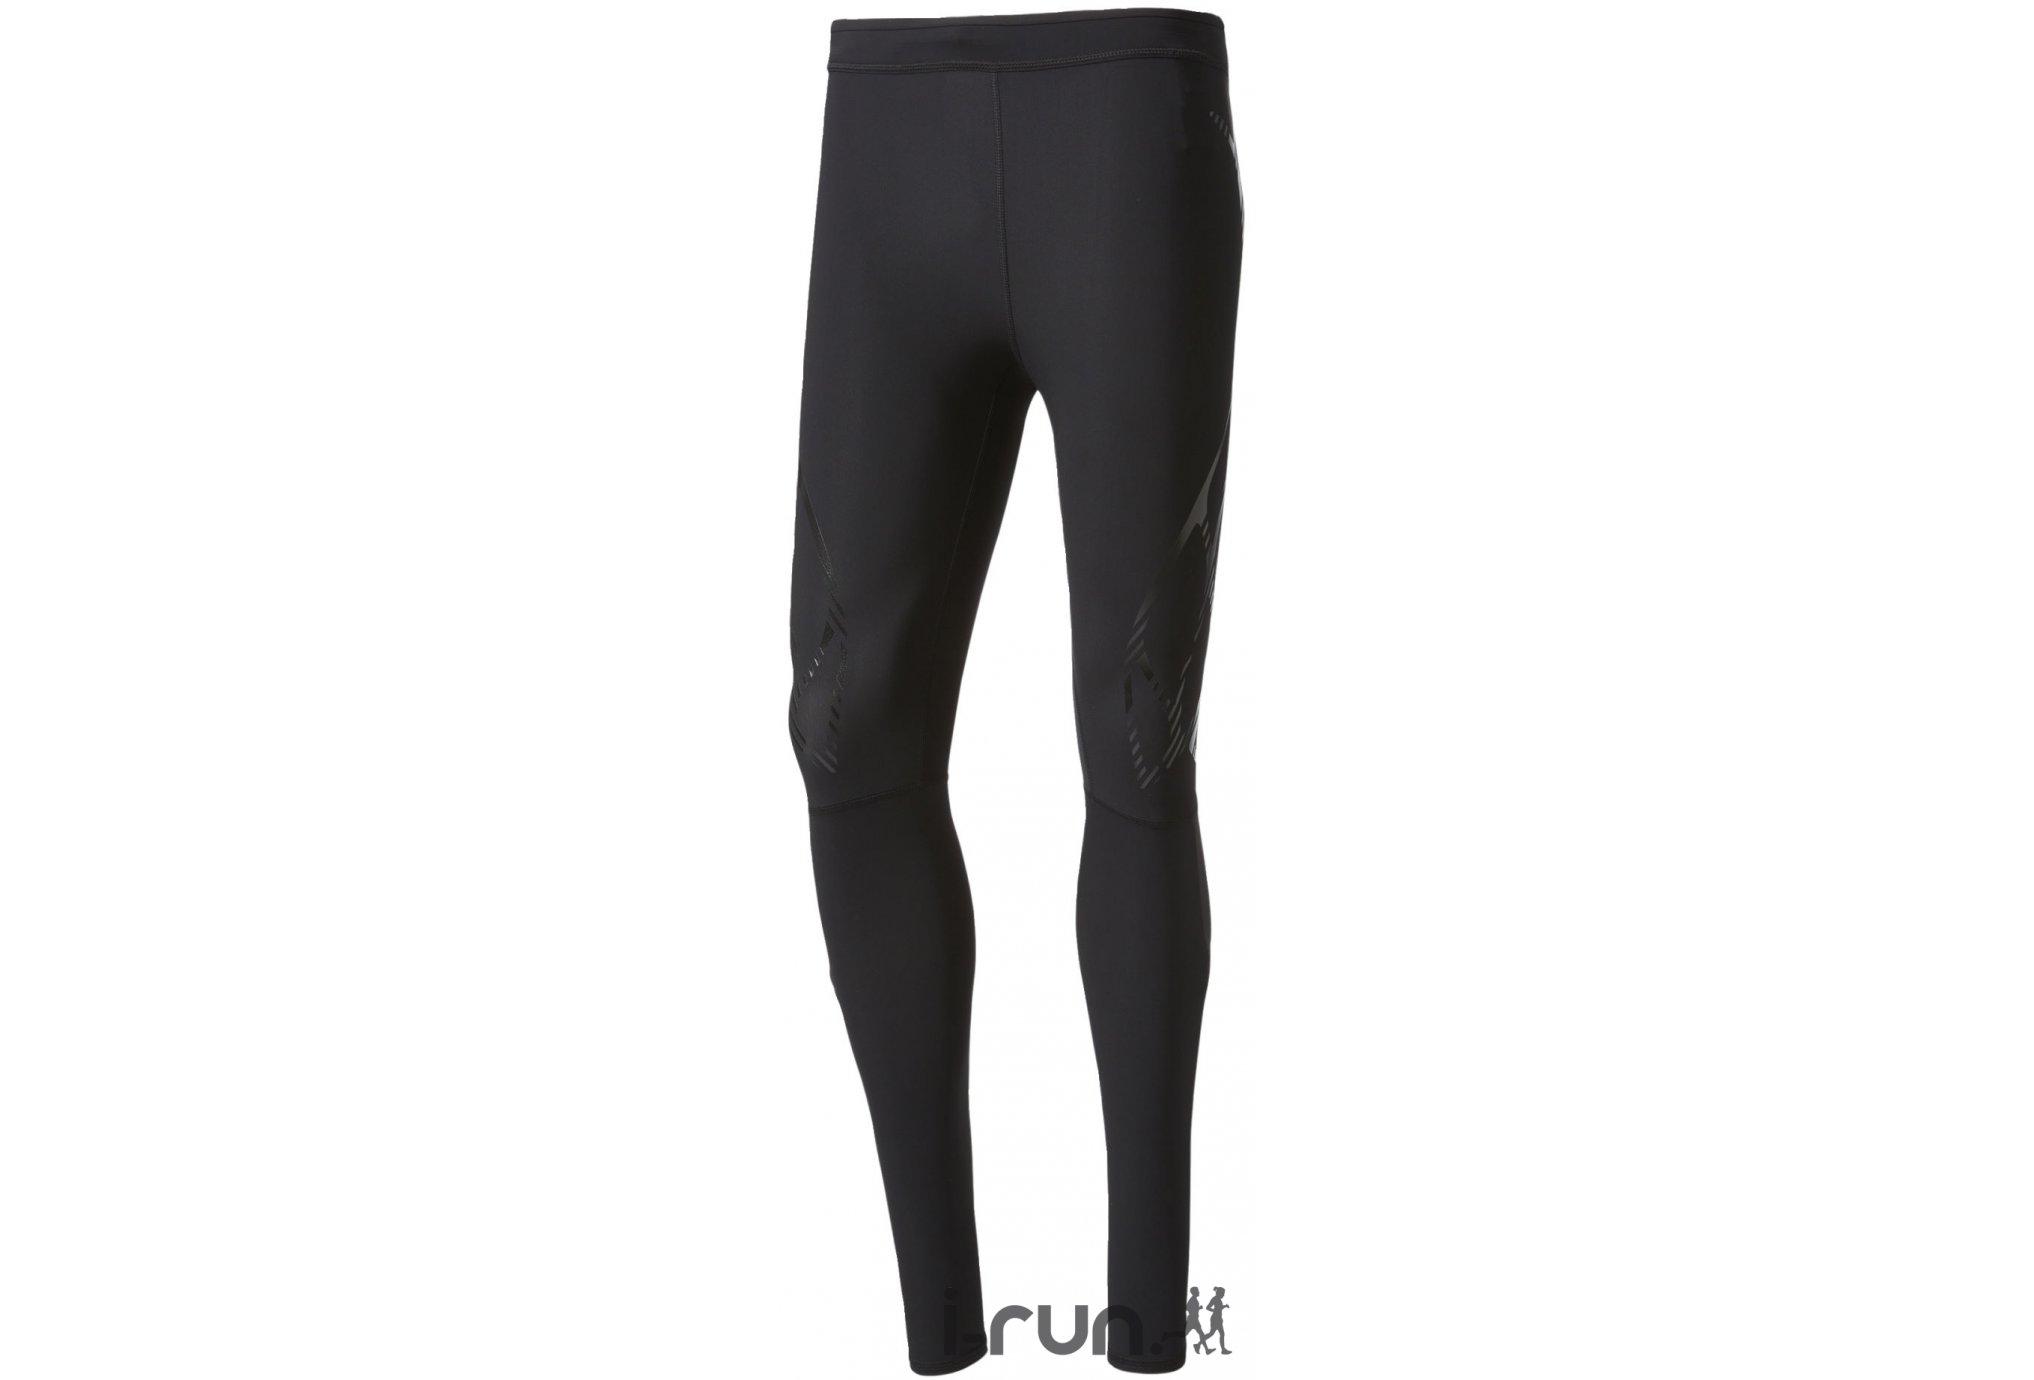 Adidas Adizero sprintweb m vêtement running homme